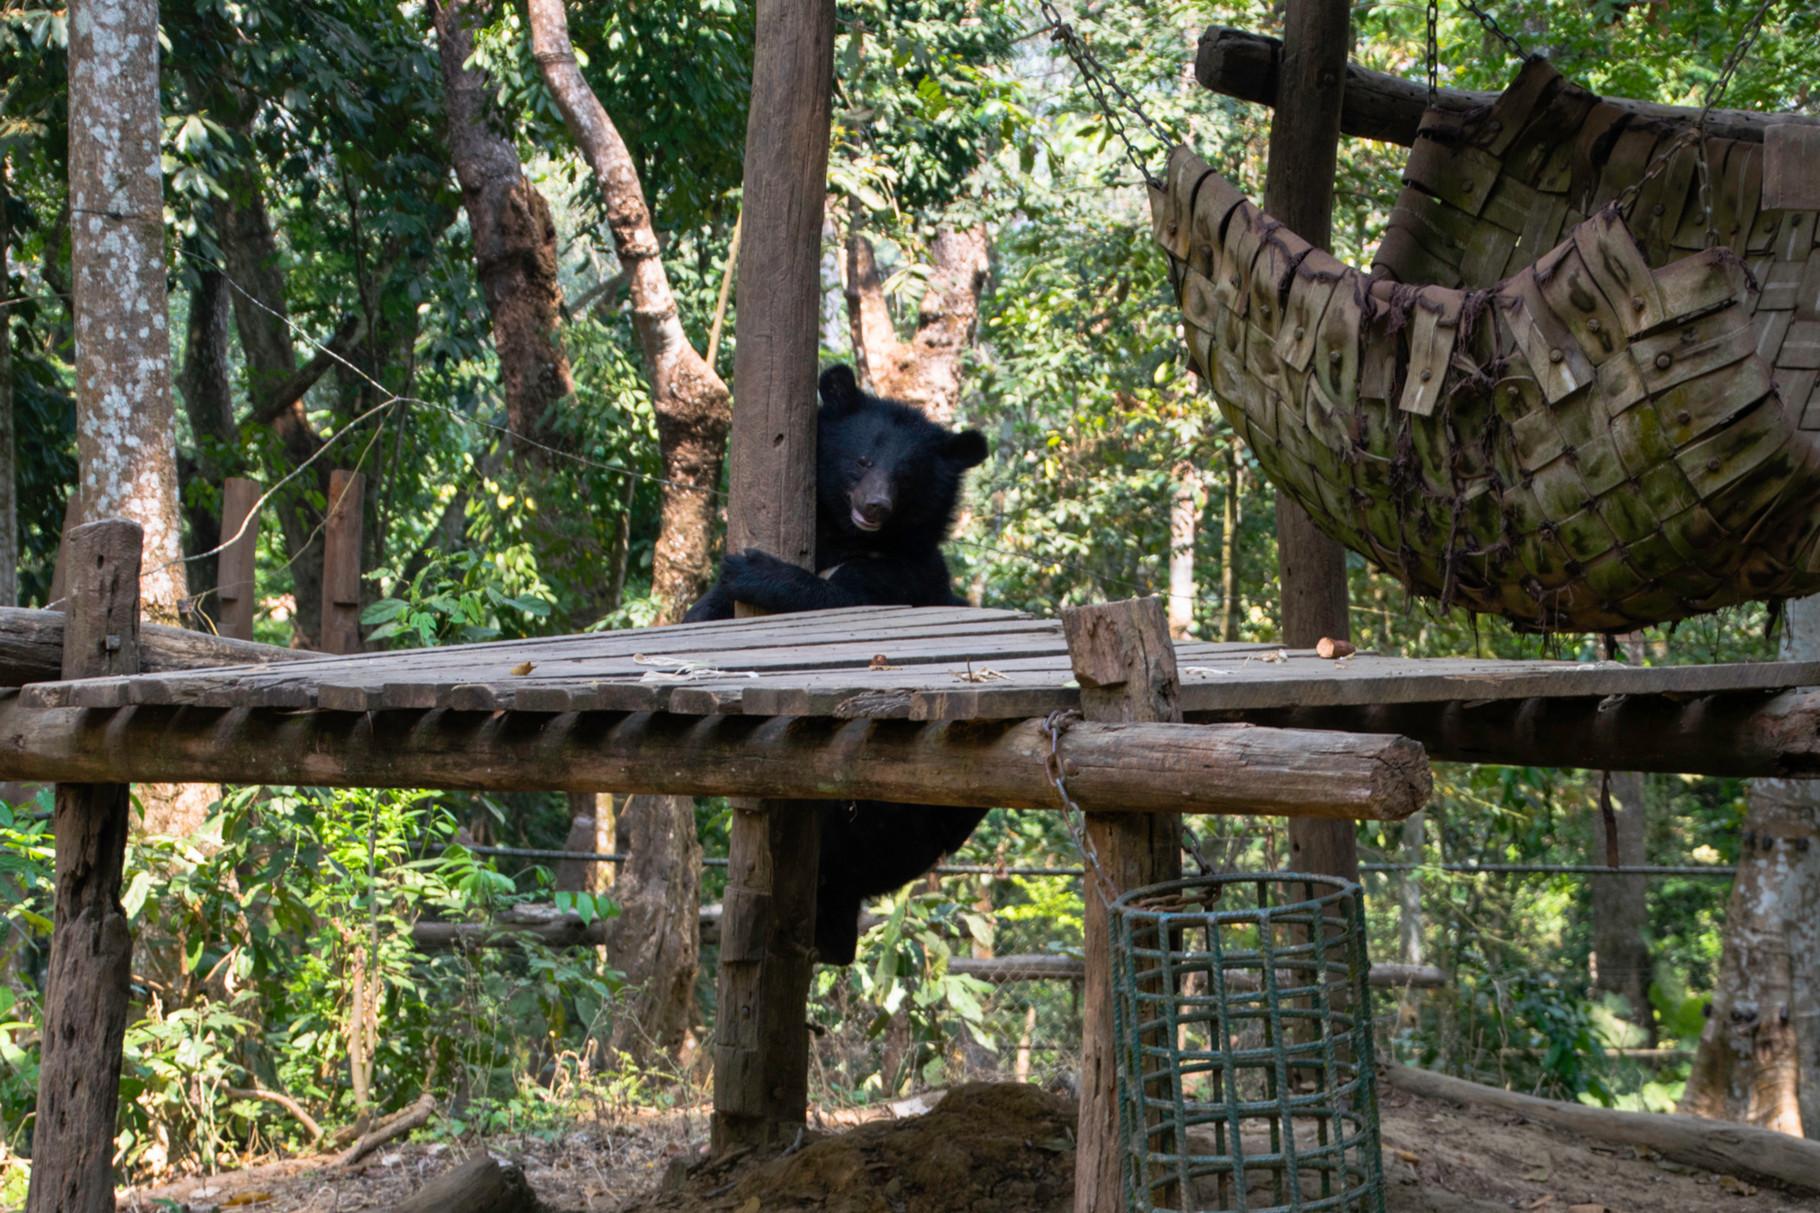 Bären-Pflegestation nahe Luang Prabang